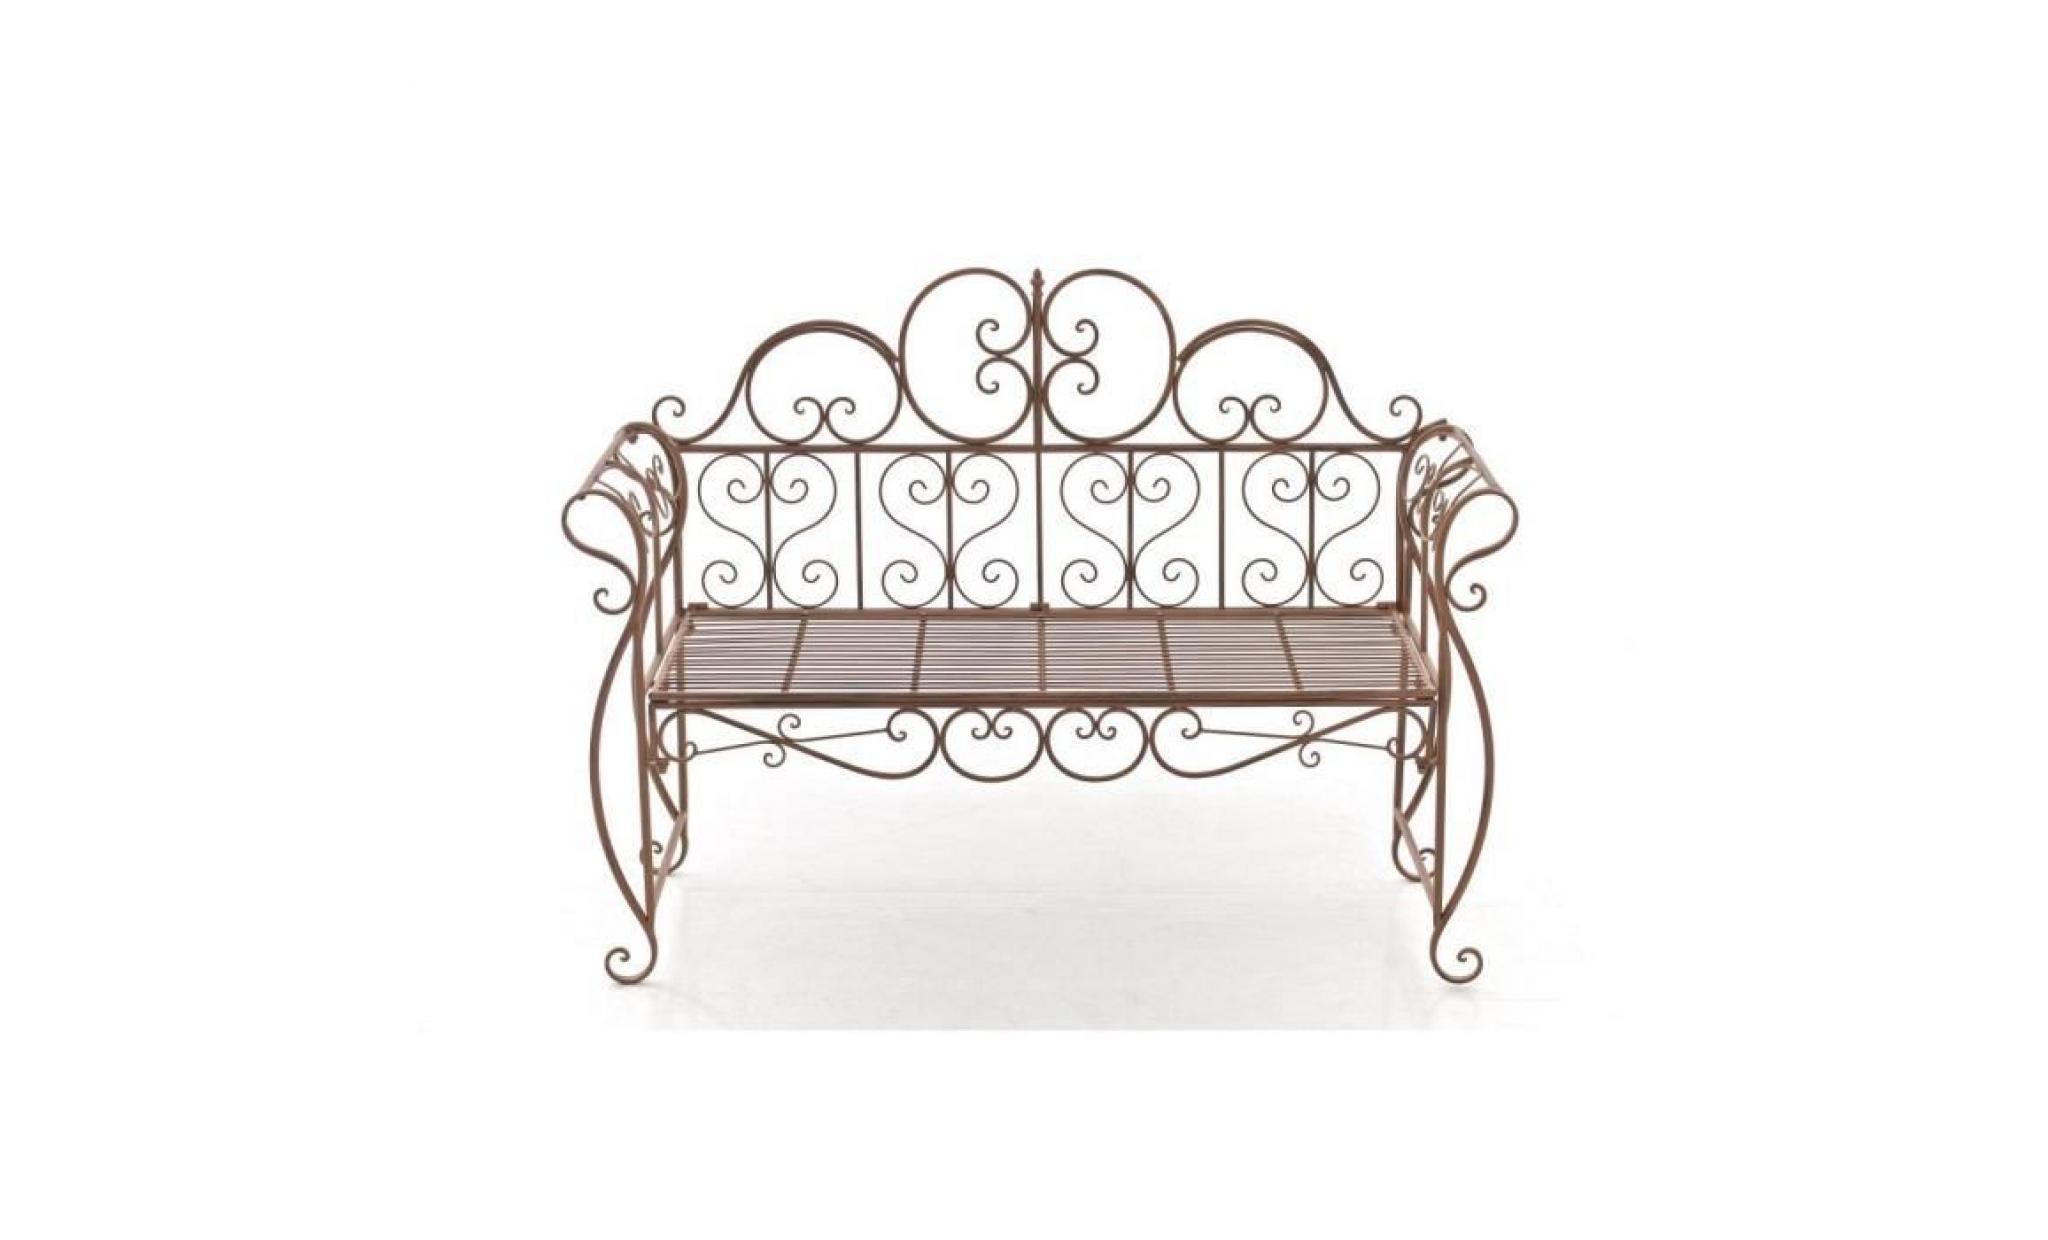 clp banquette de jardin antique minna en fer forg laqu. Black Bedroom Furniture Sets. Home Design Ideas